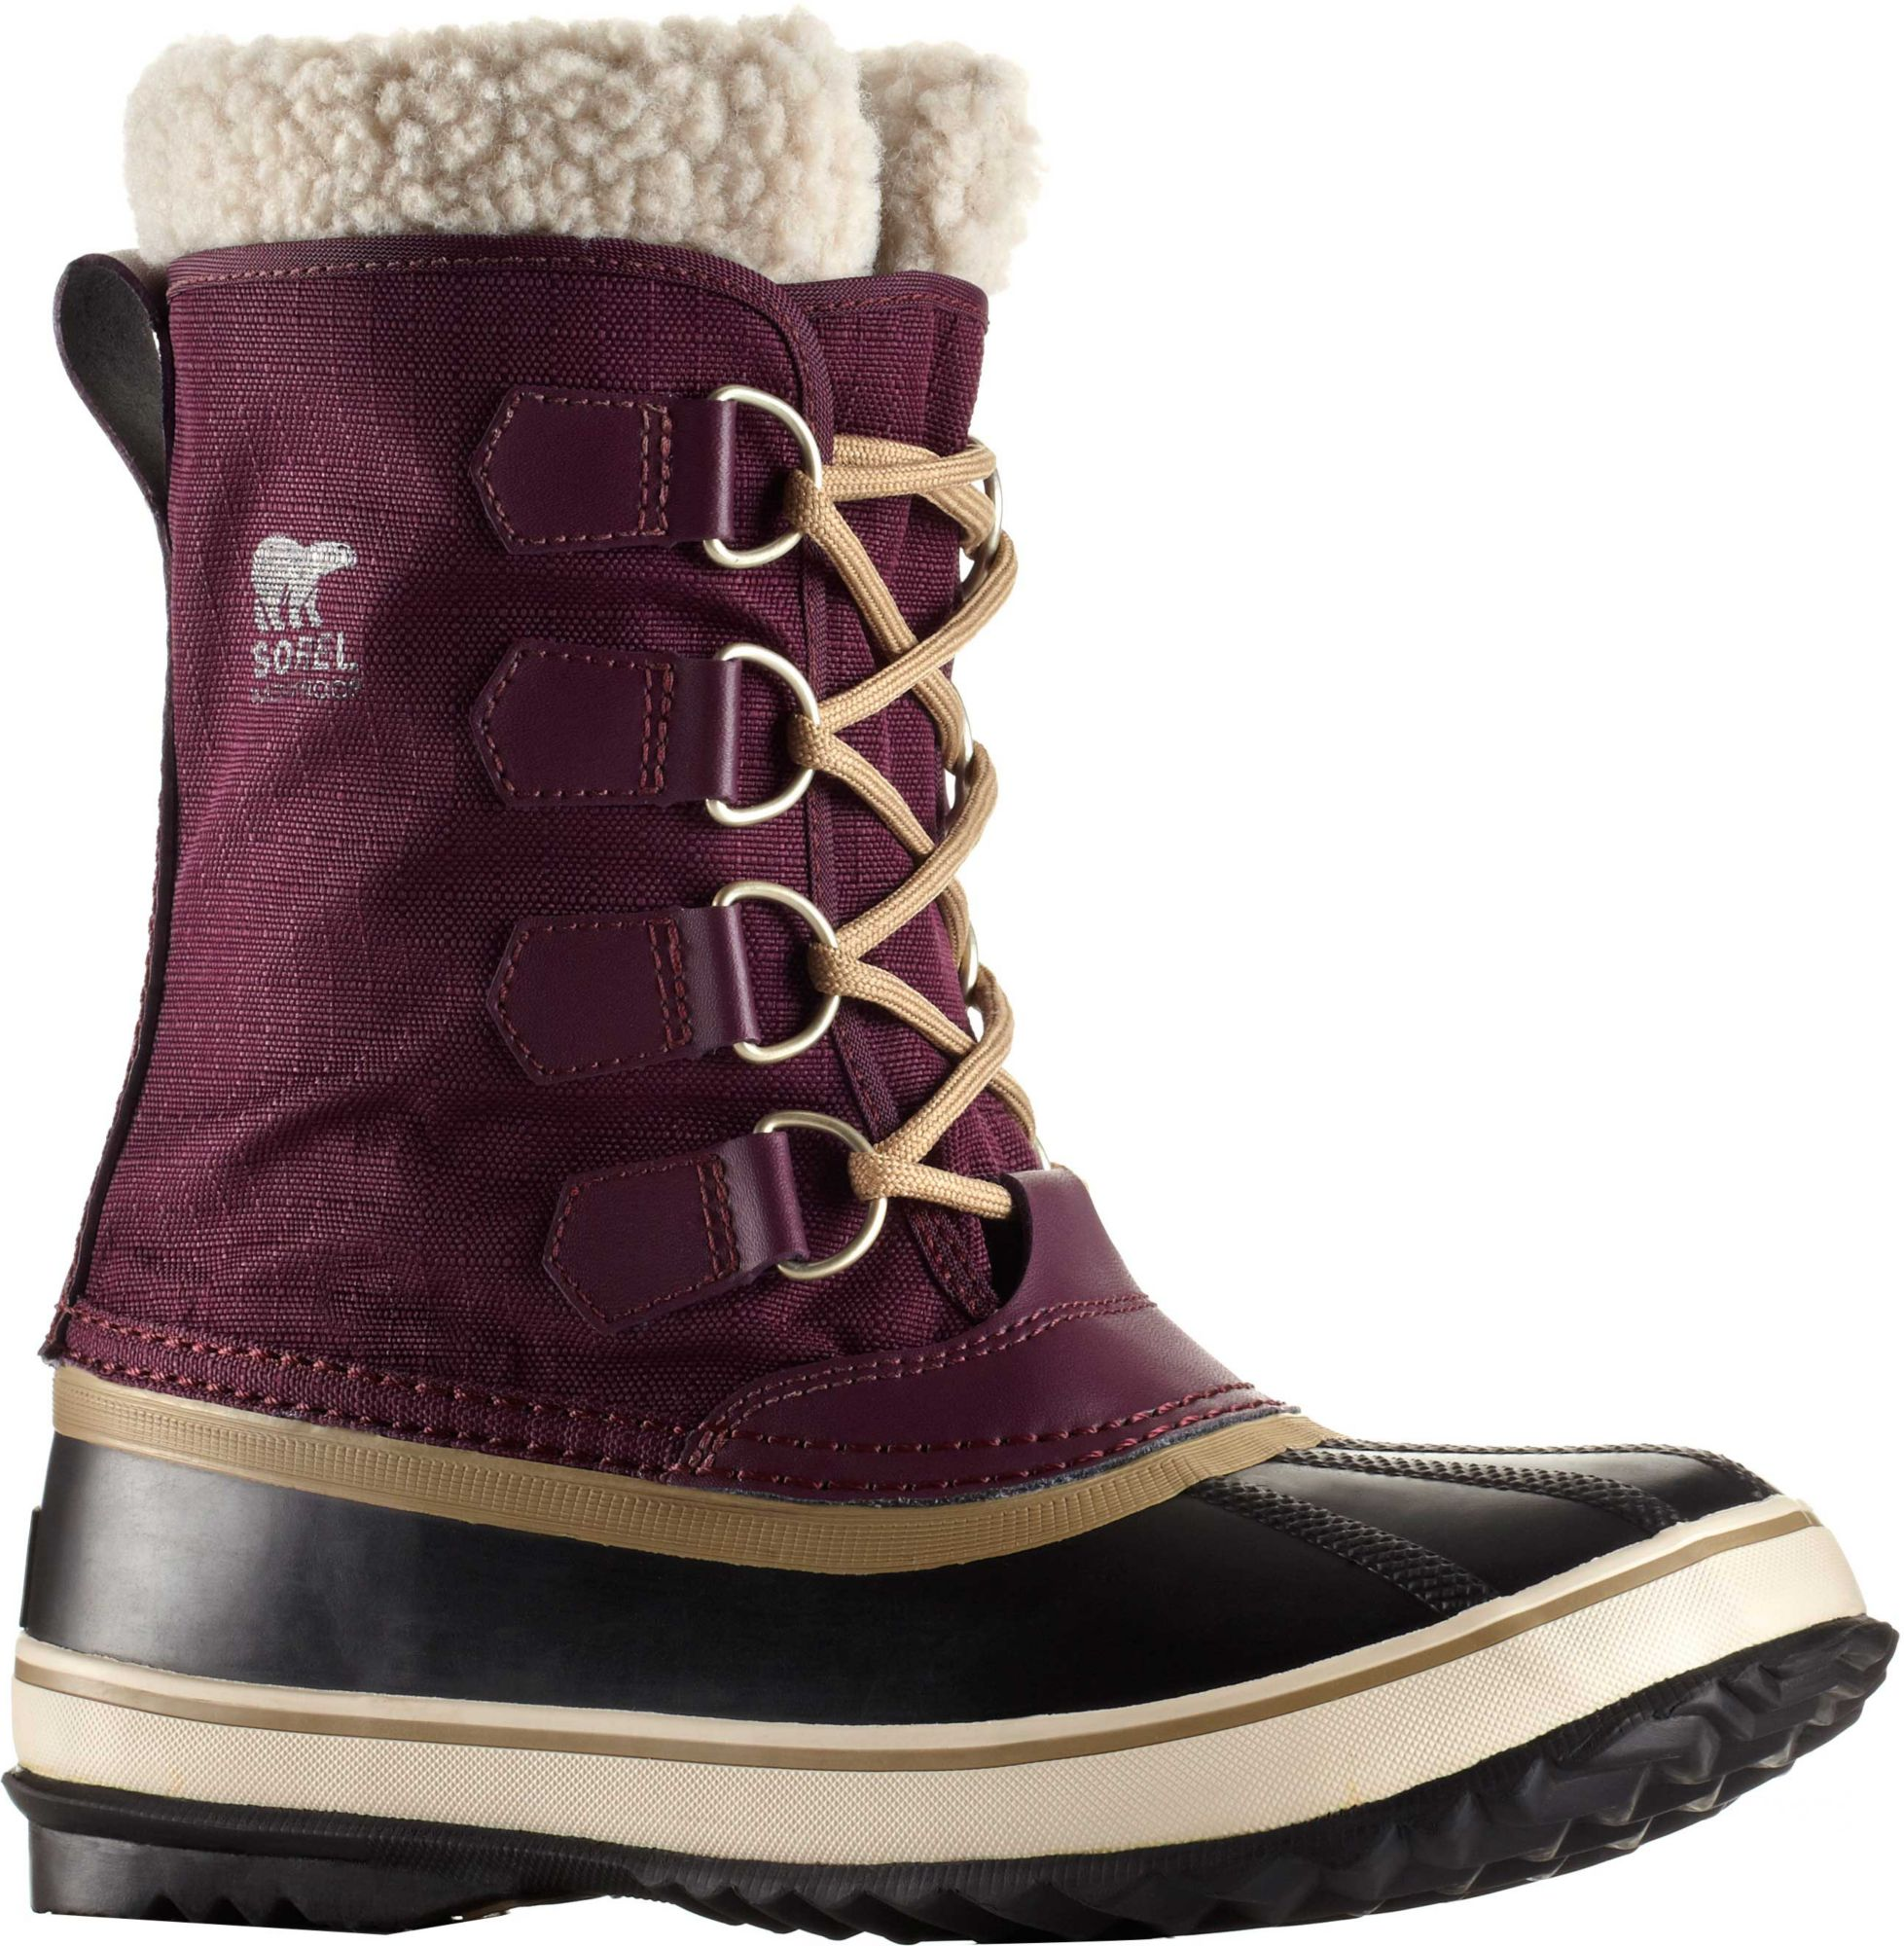 sorel womens boots noimagefound ??? mdaowxe